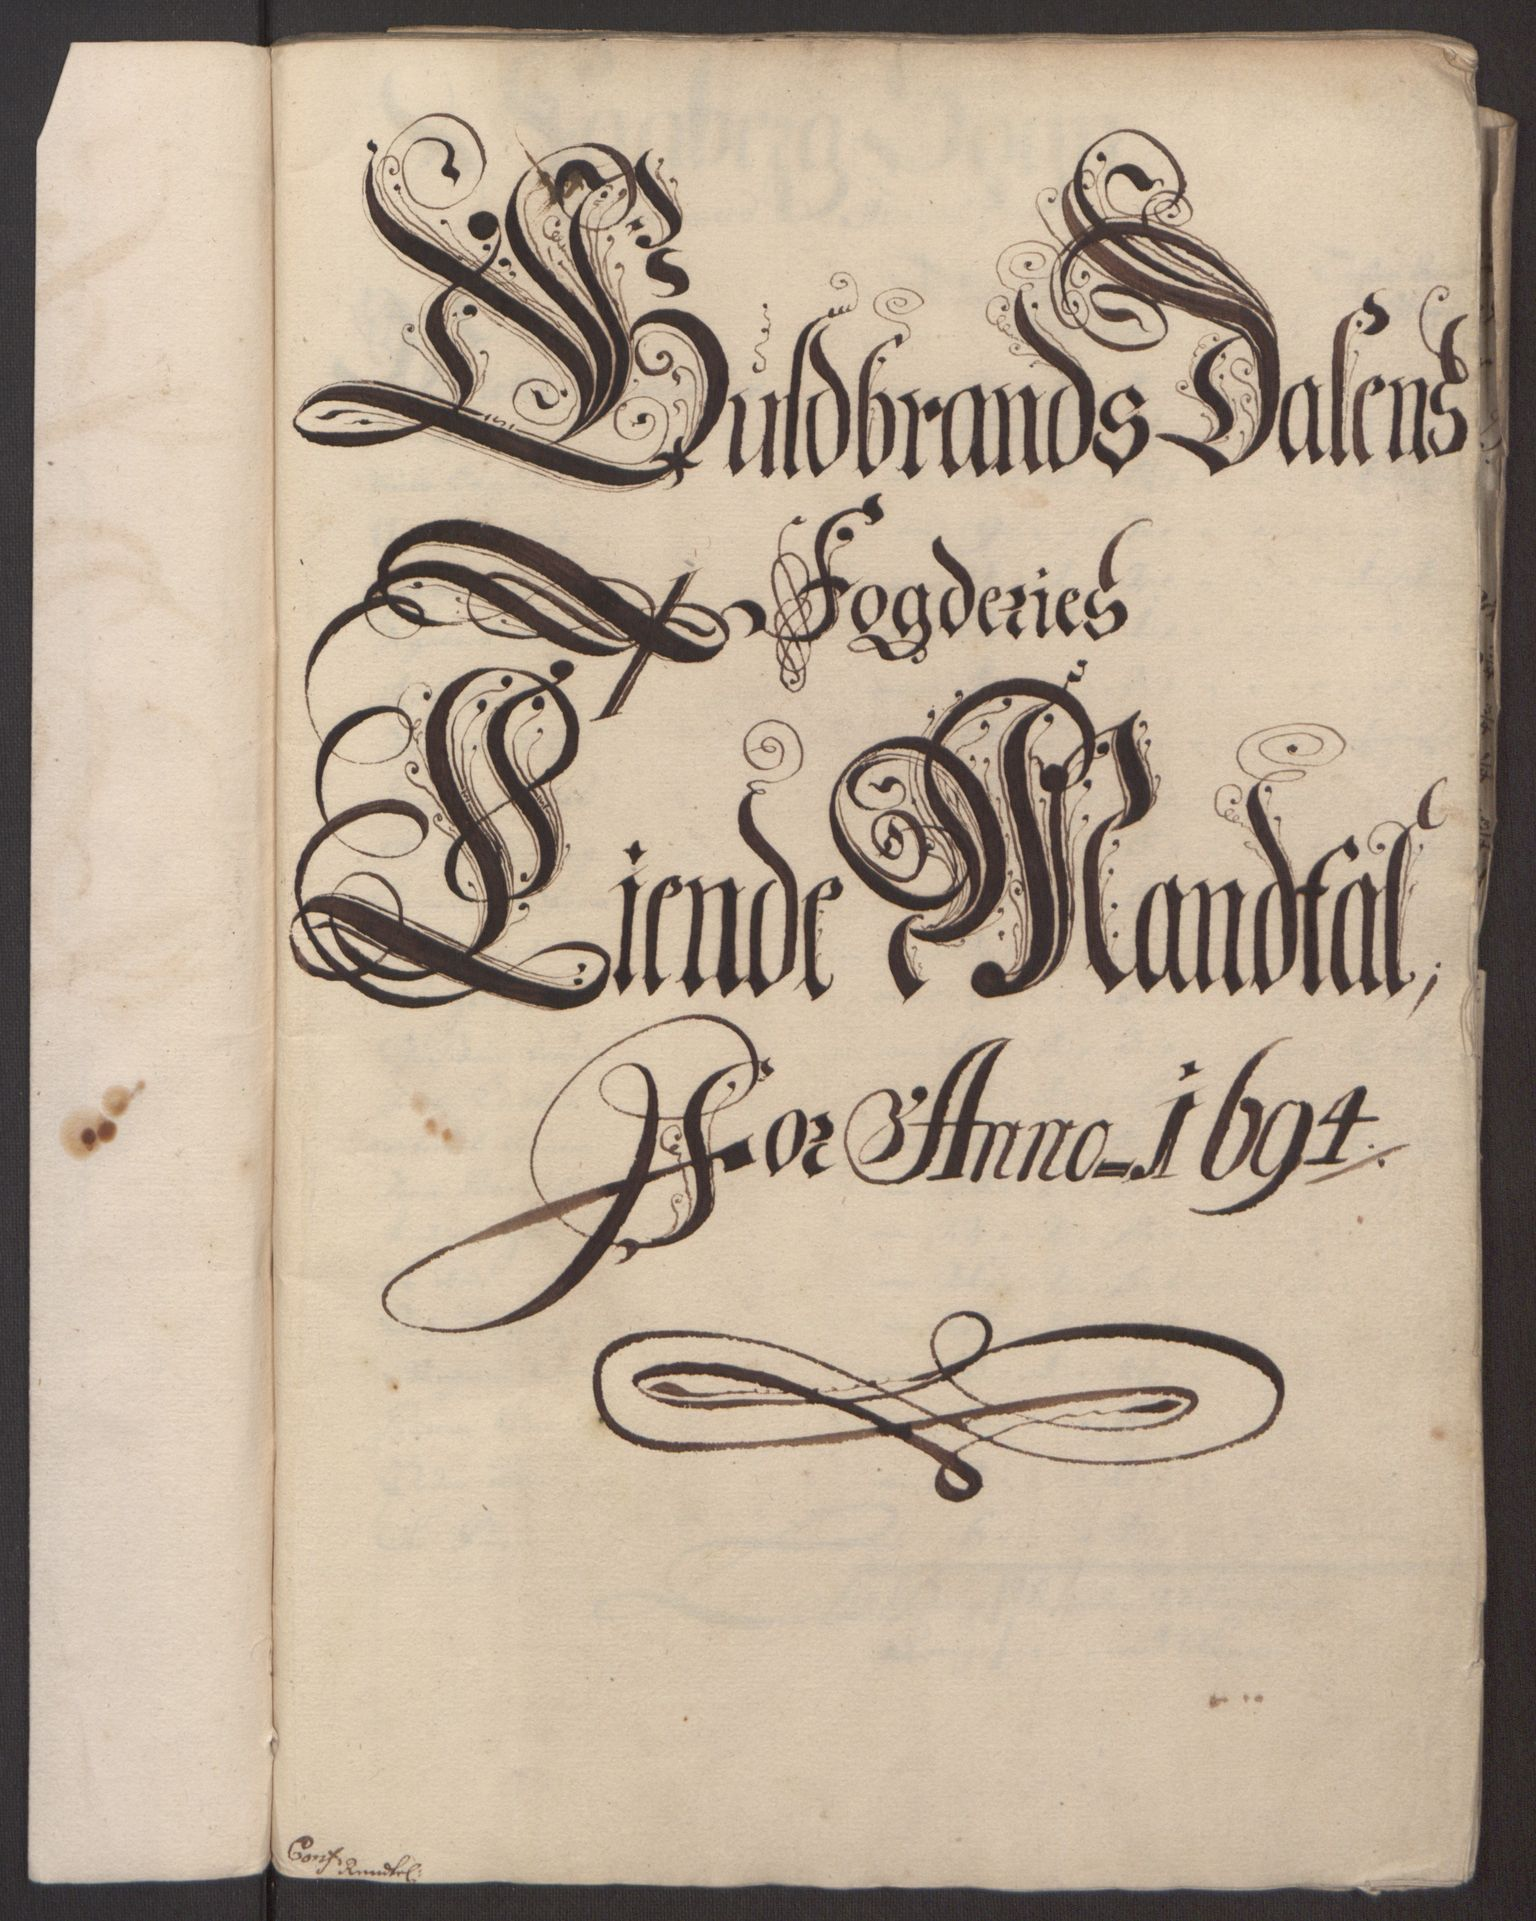 RA, Rentekammeret inntil 1814, Reviderte regnskaper, Fogderegnskap, R17/L1168: Fogderegnskap Gudbrandsdal, 1694, s. 229